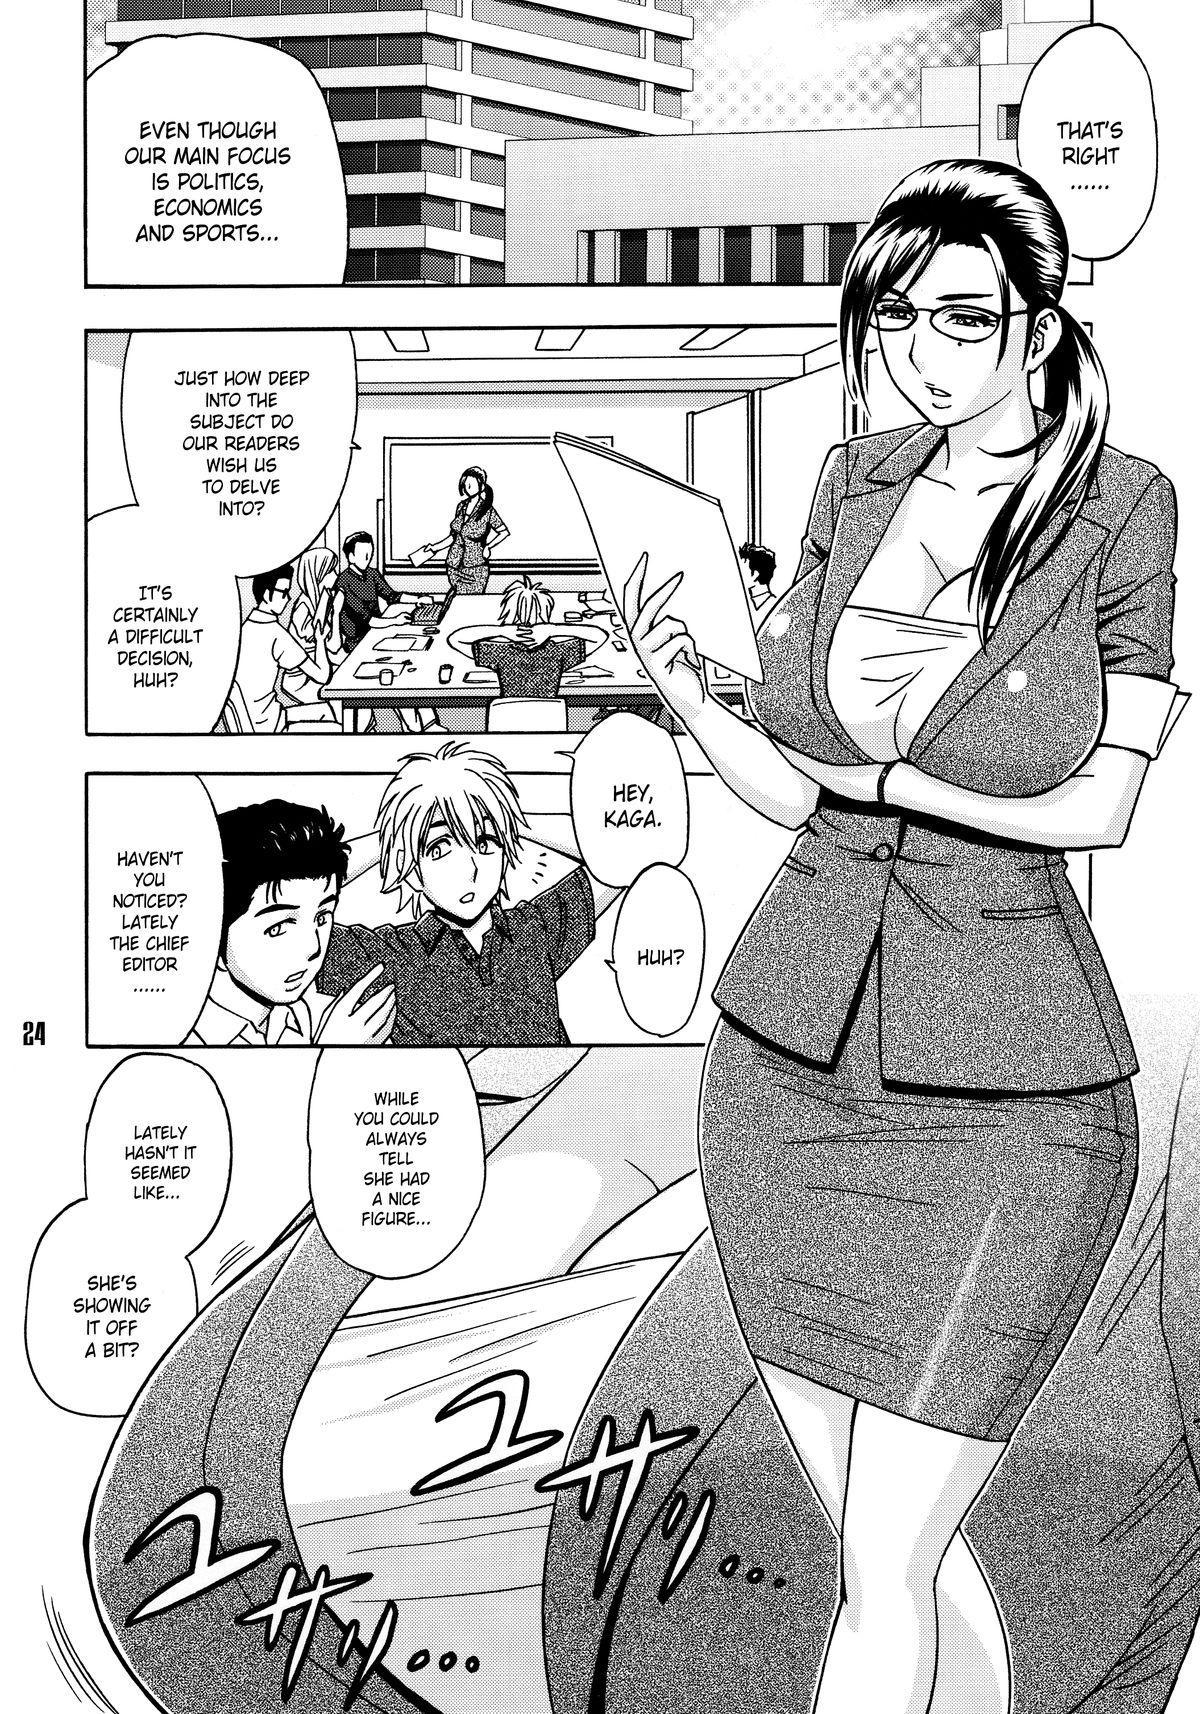 [Madam Project (Tatsunami Youtoku)] Bijin Henshuu-chou no Himitsu (1)   Beautiful Editor-in-Chief's Secret (1) [English] [Forbiddenfetish77] [Decensored] 23